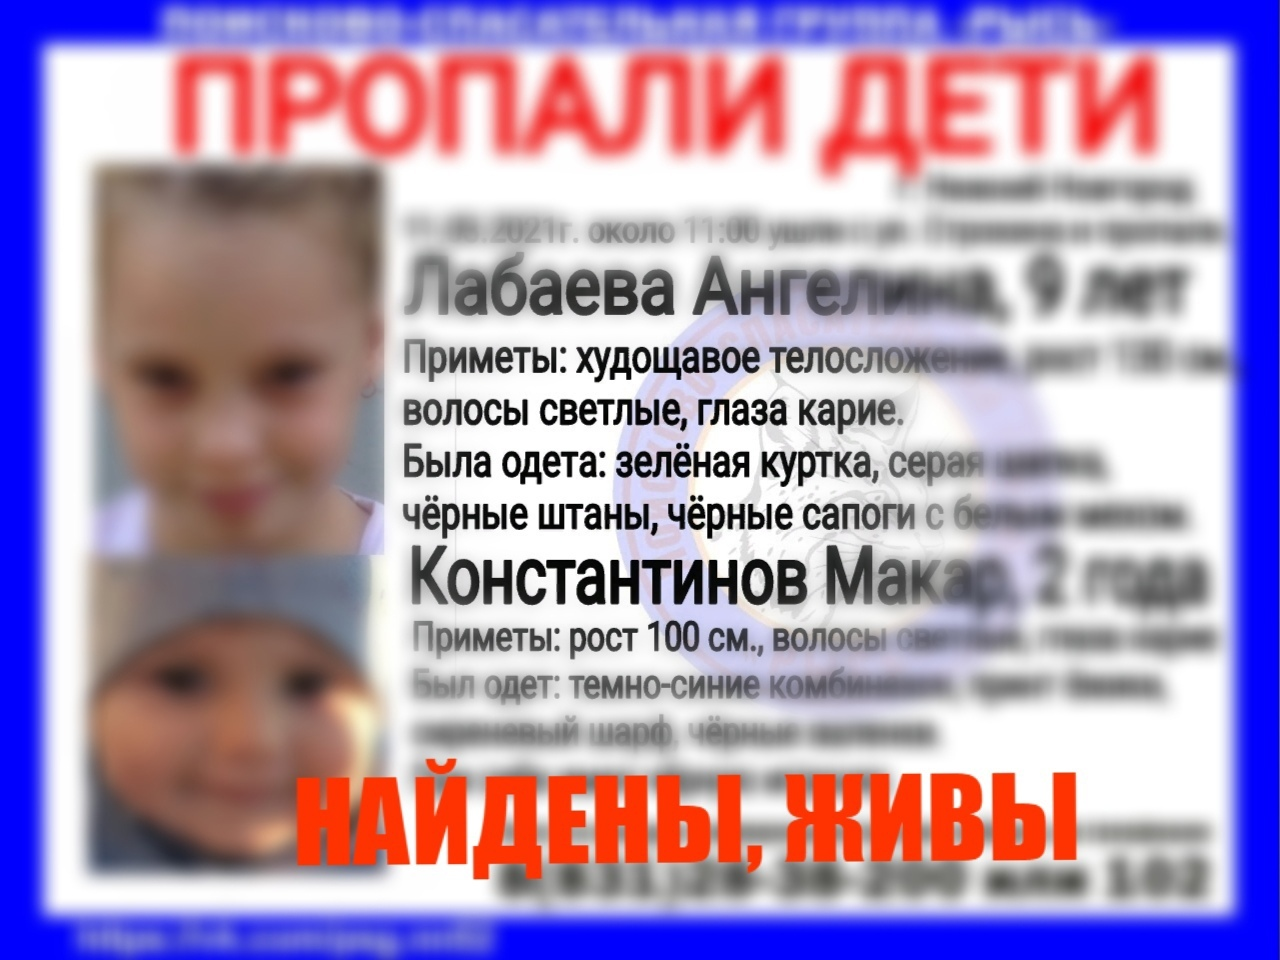 Лабаева Ангелина, Константинов Макар